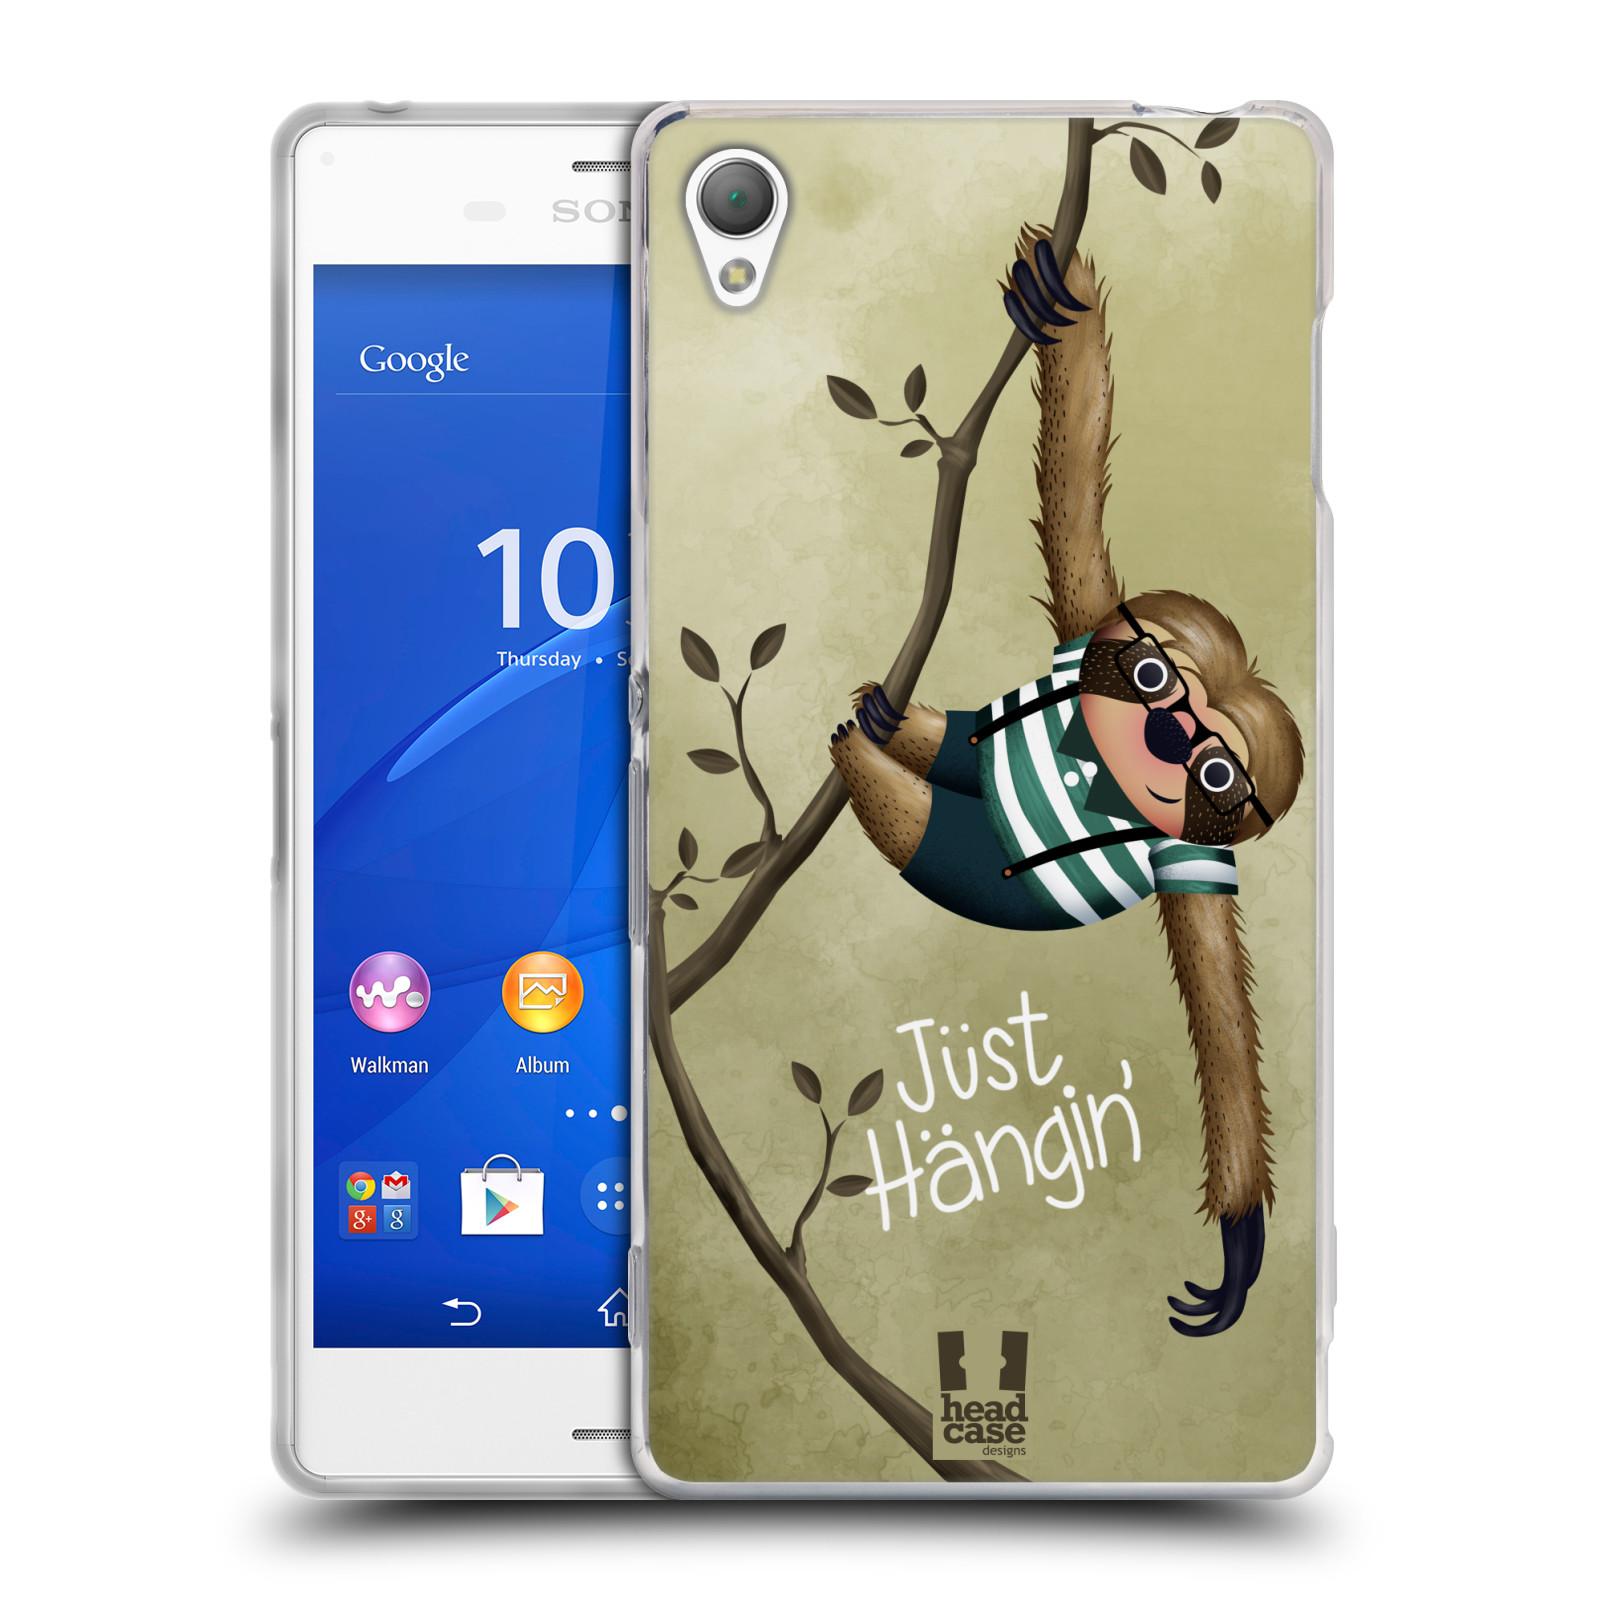 Silikonové pouzdro na mobil Sony Xperia Z3 D6603 HEAD CASE Lenochod Just Hangin